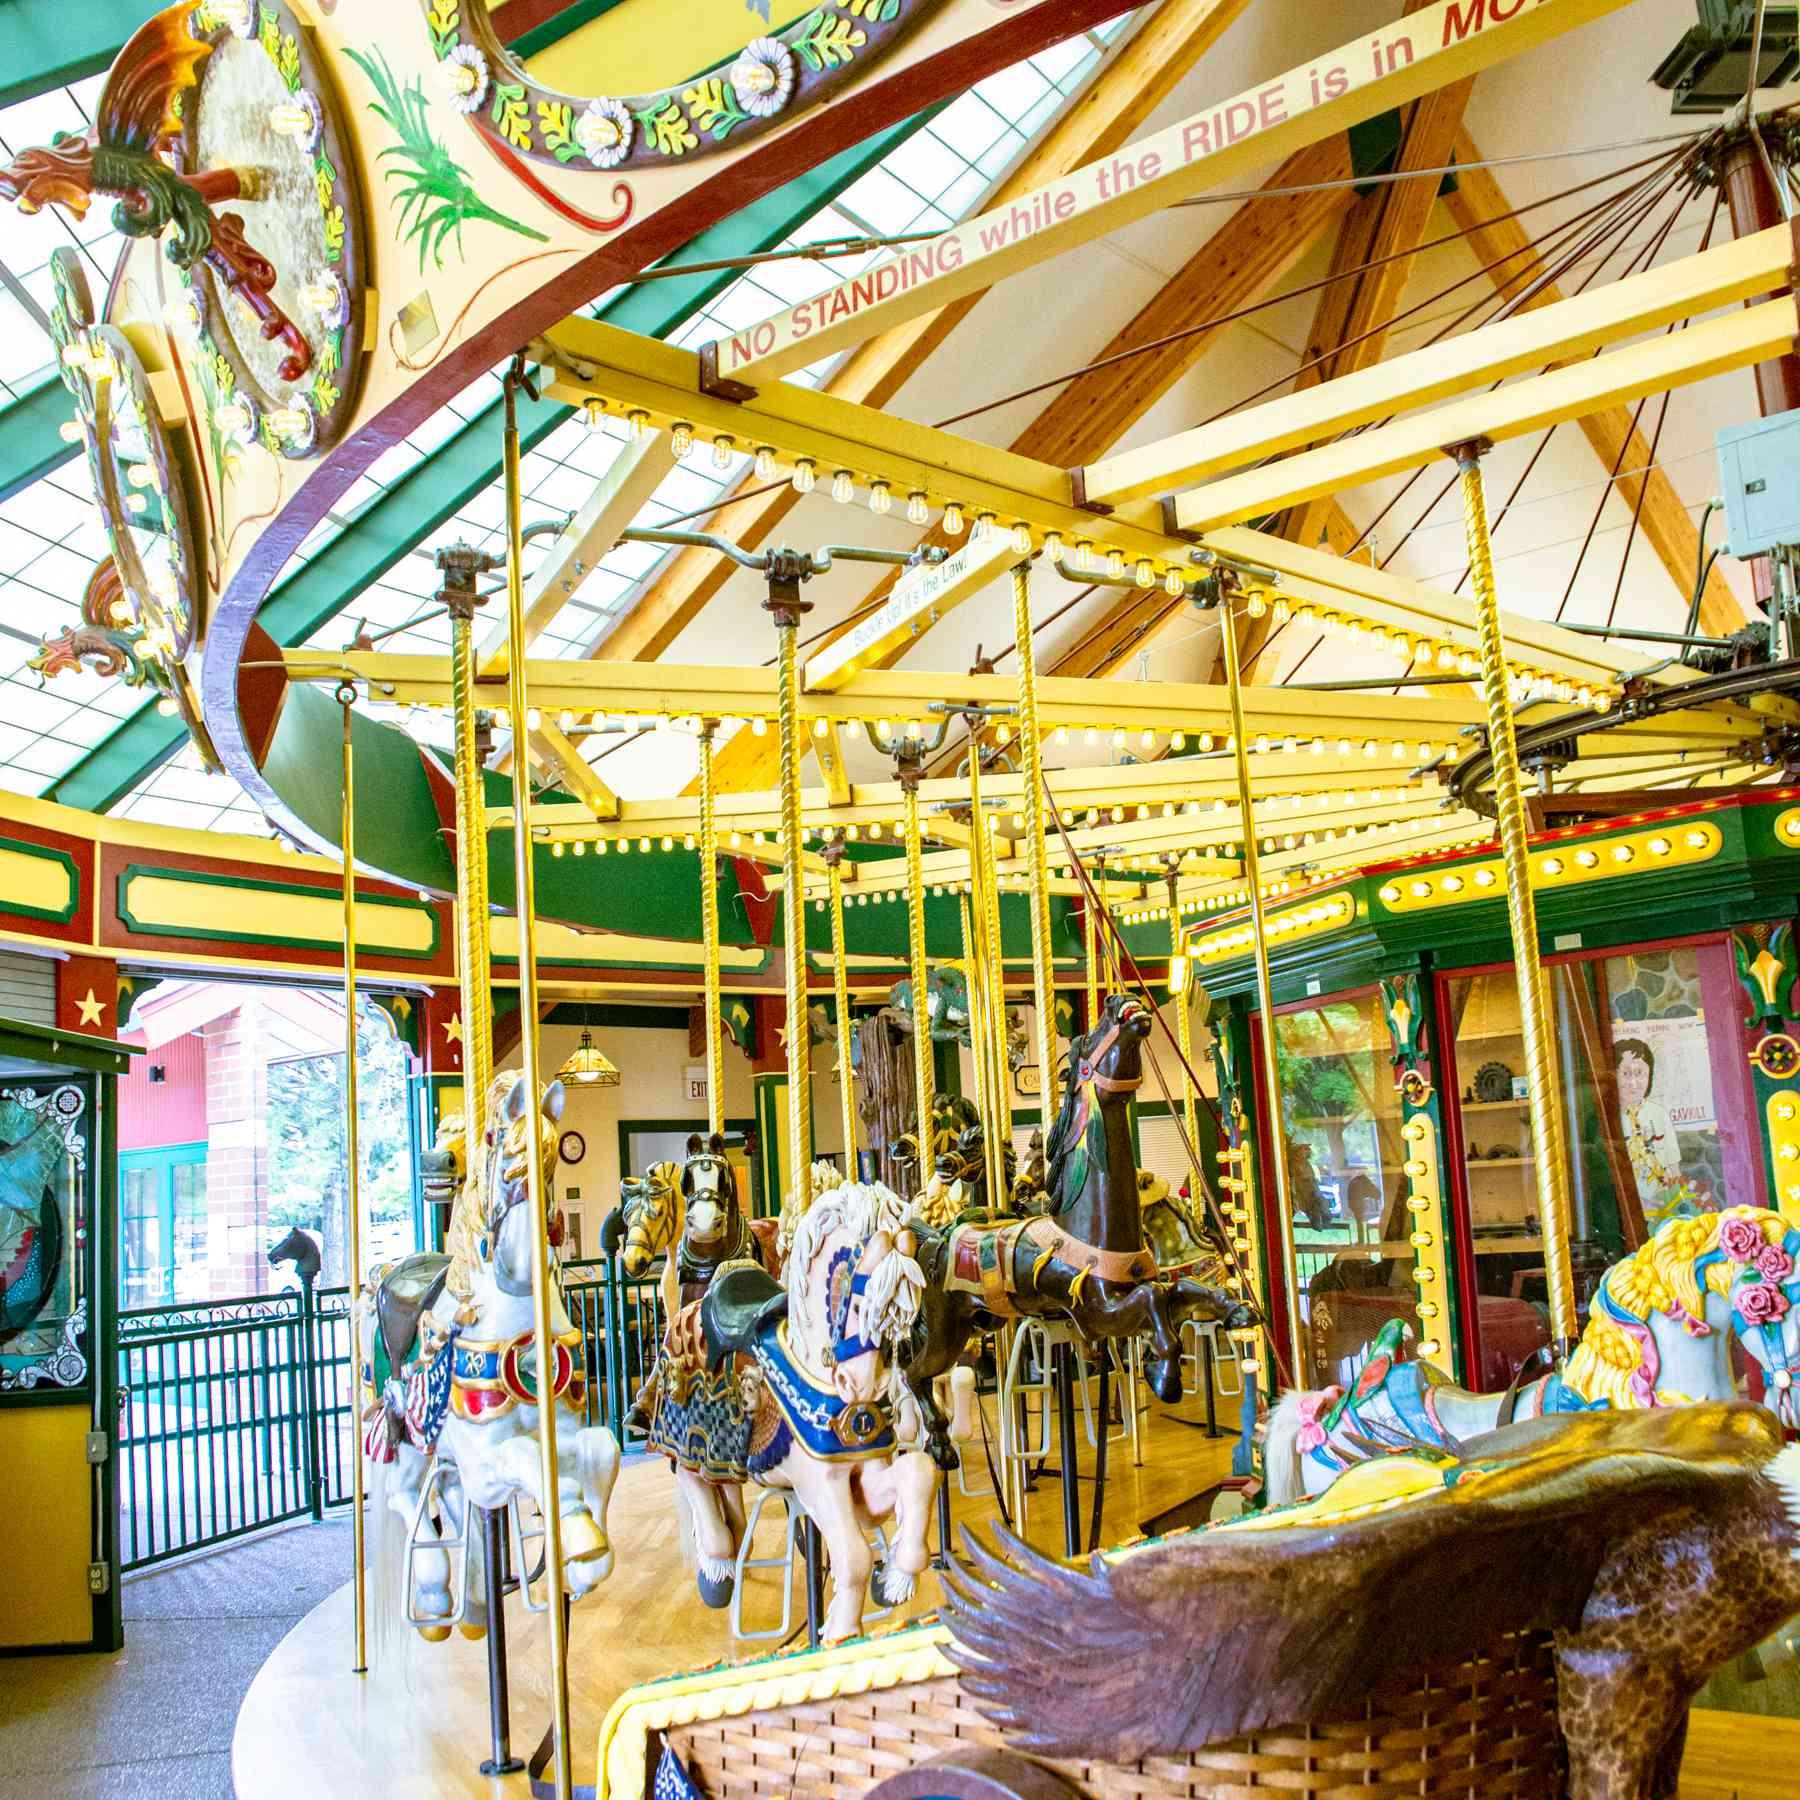 Carousel in Carras Park